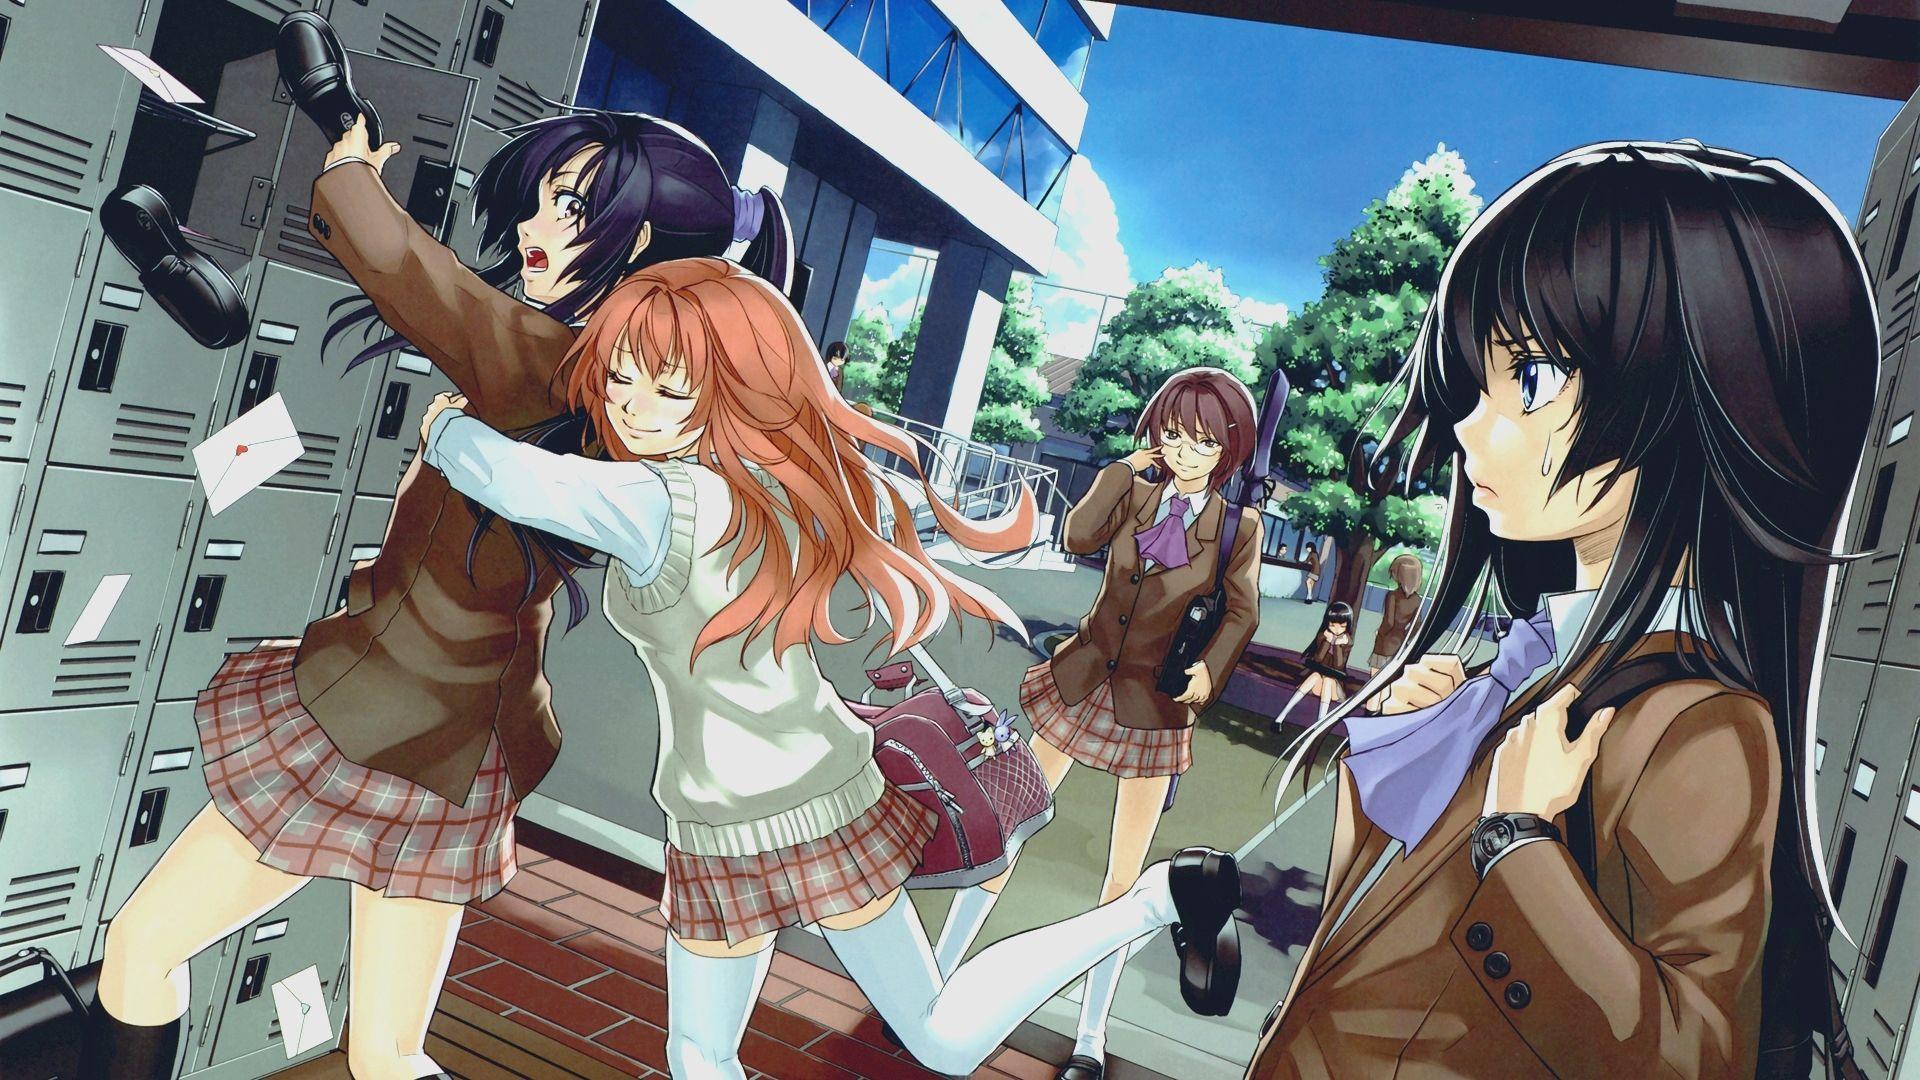 Anime School Girls Widescreen Wallpaper Wide Wallpapers Net